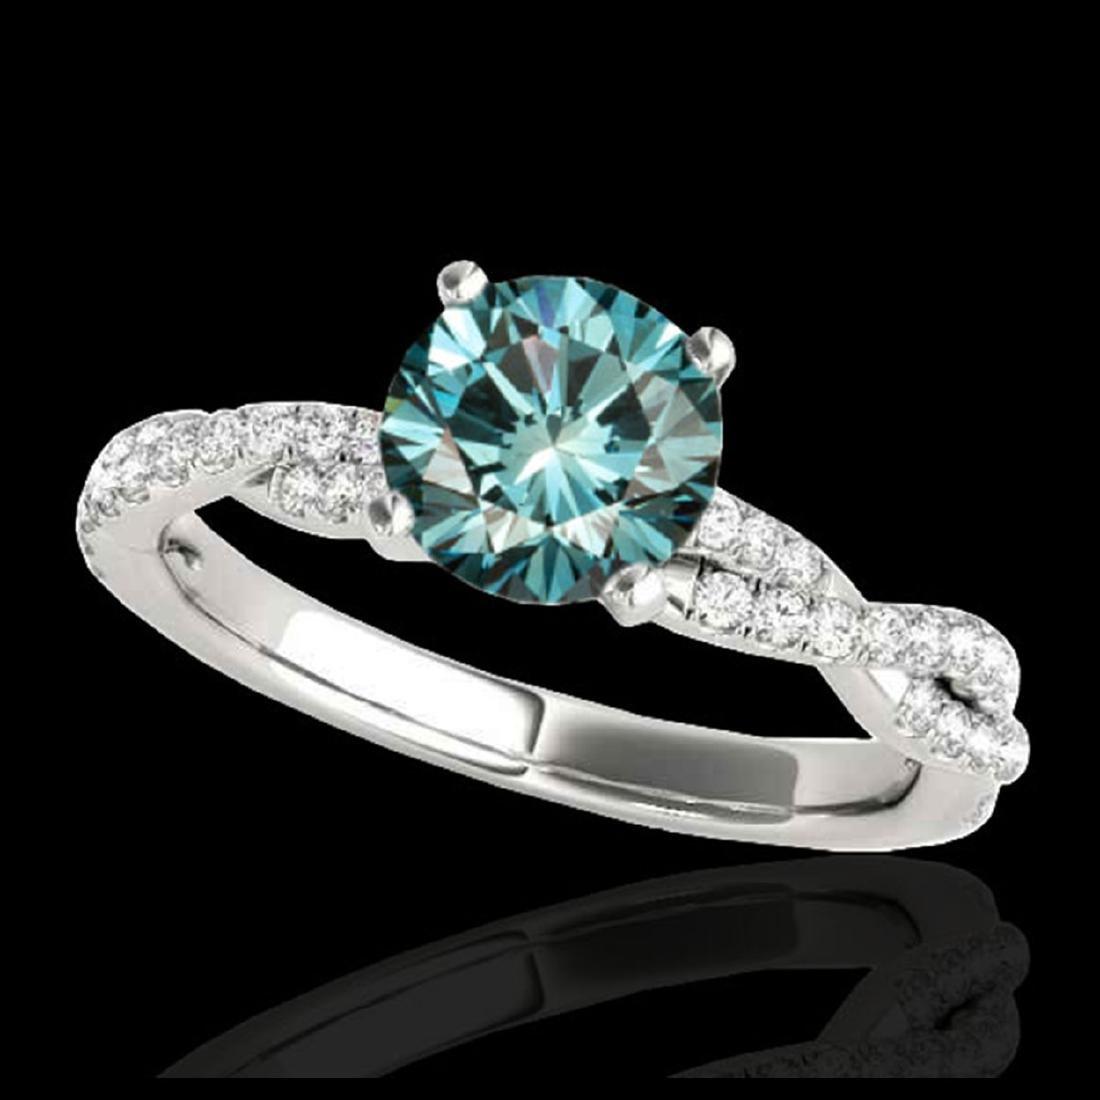 1.25 ctw SI Fancy Blue Diamond Solitaire Ring 10K White